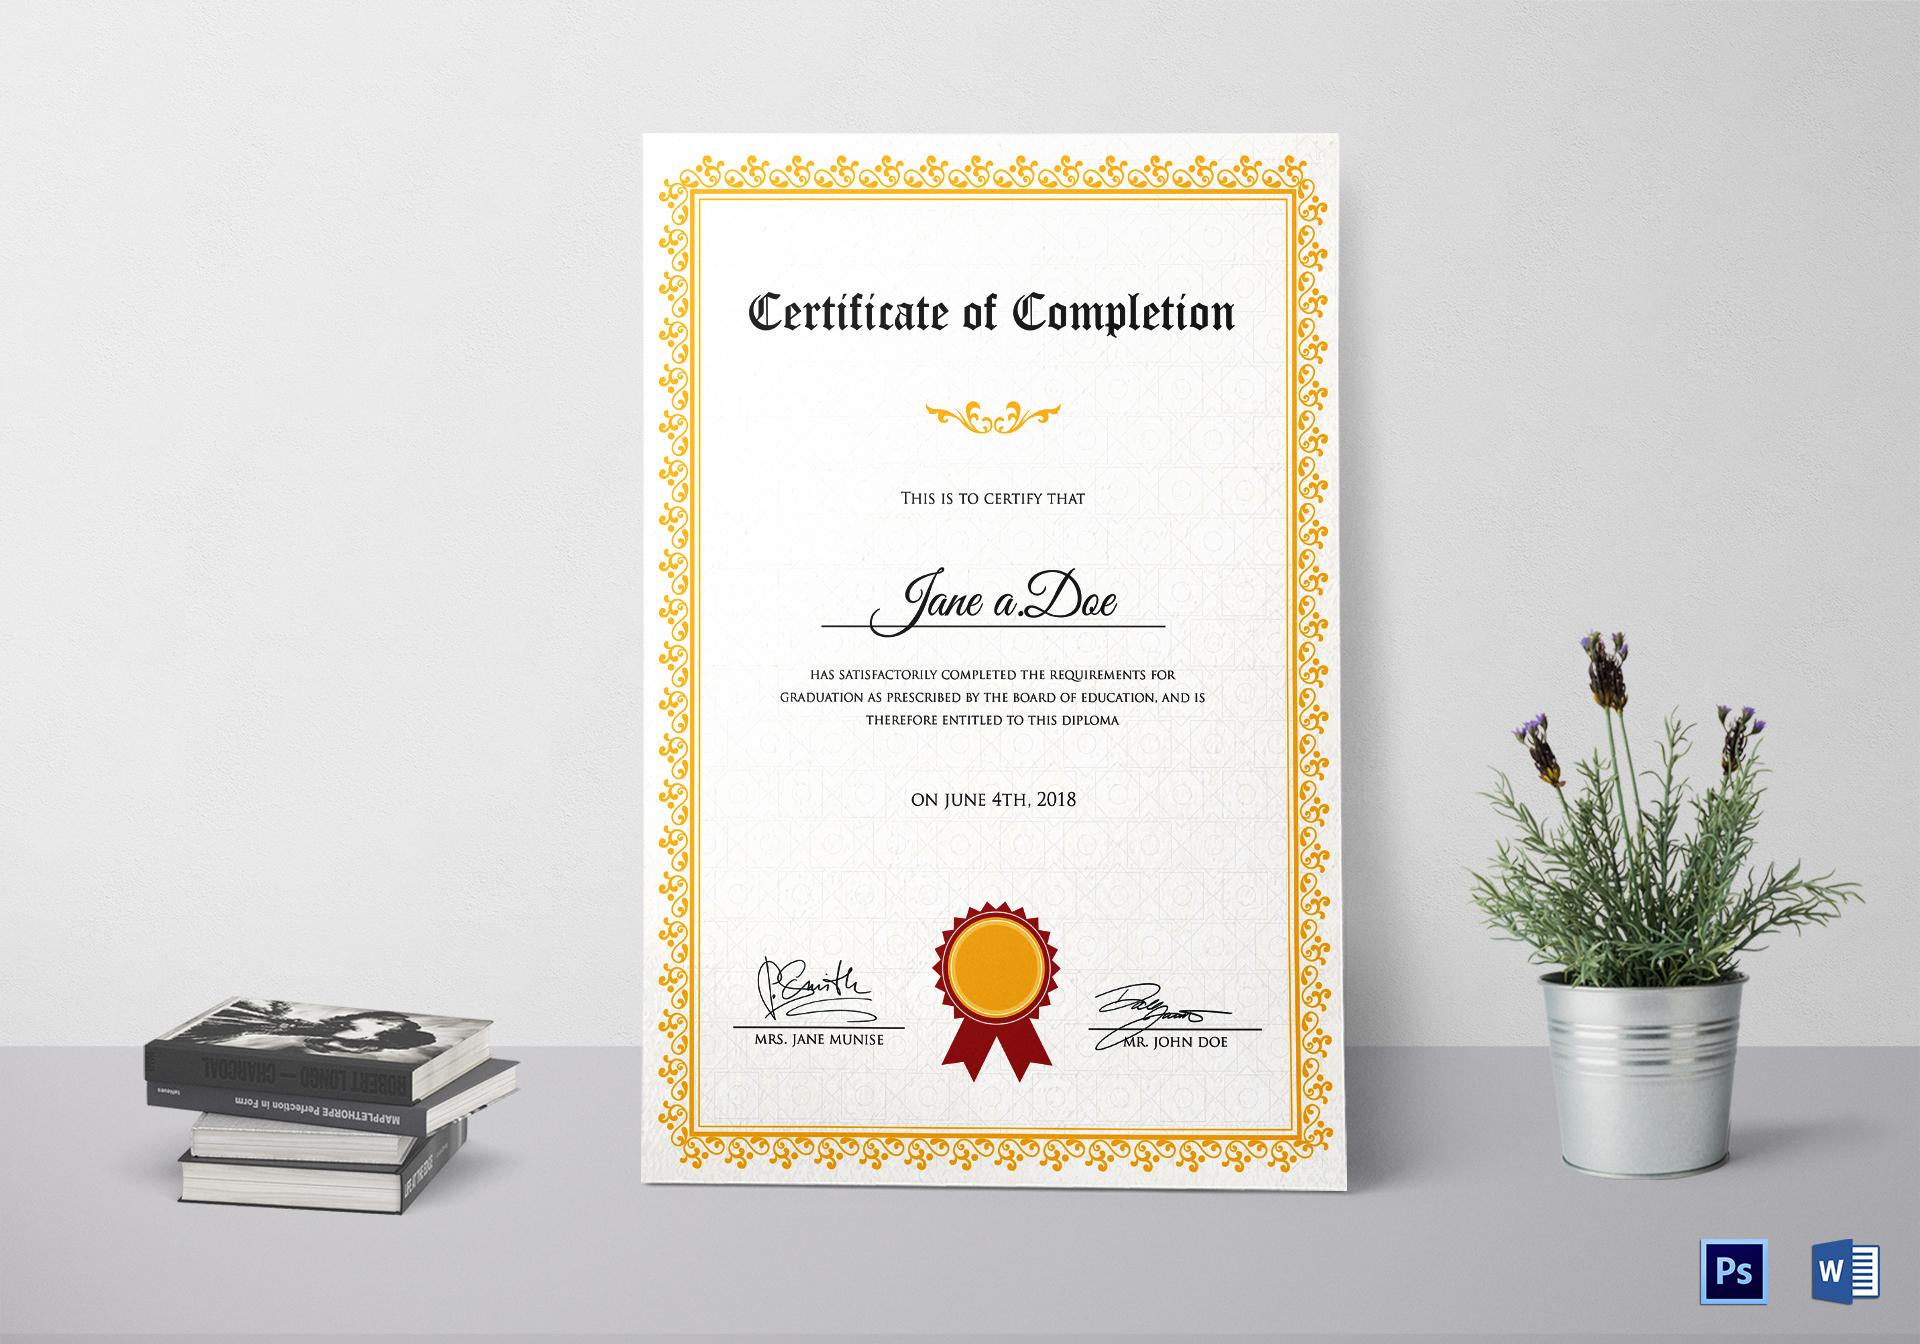 Graduation Completion Certificate